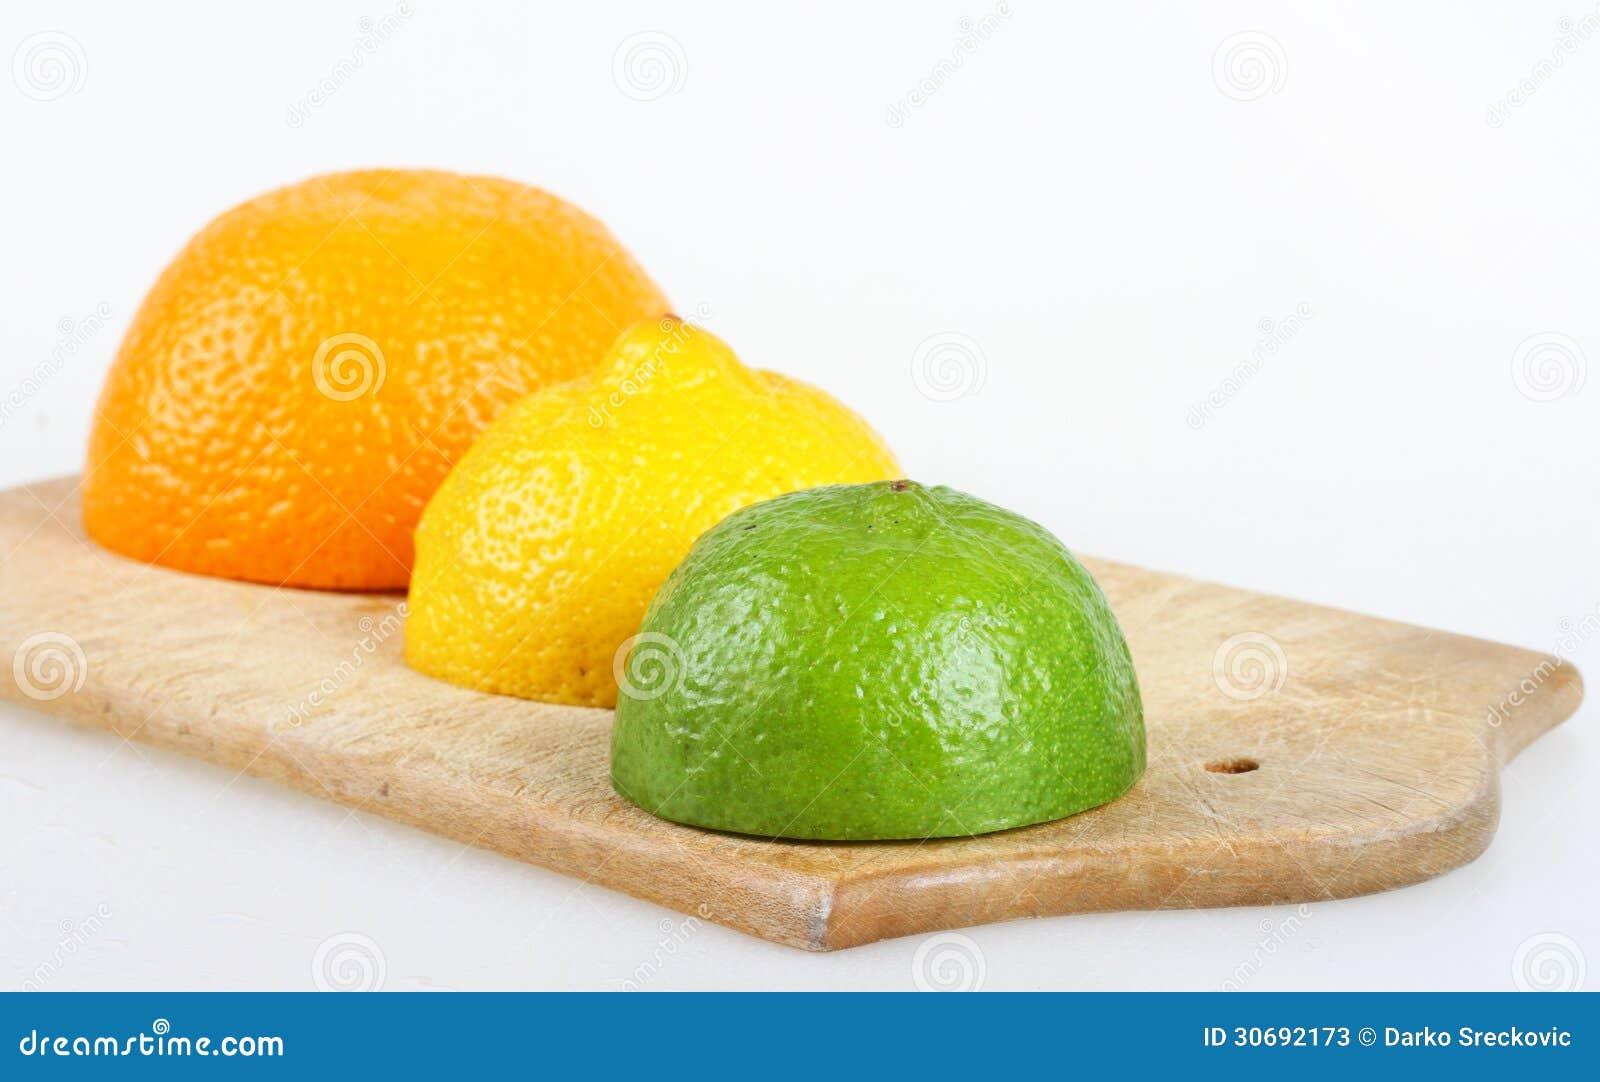 how to cut a lemon in half